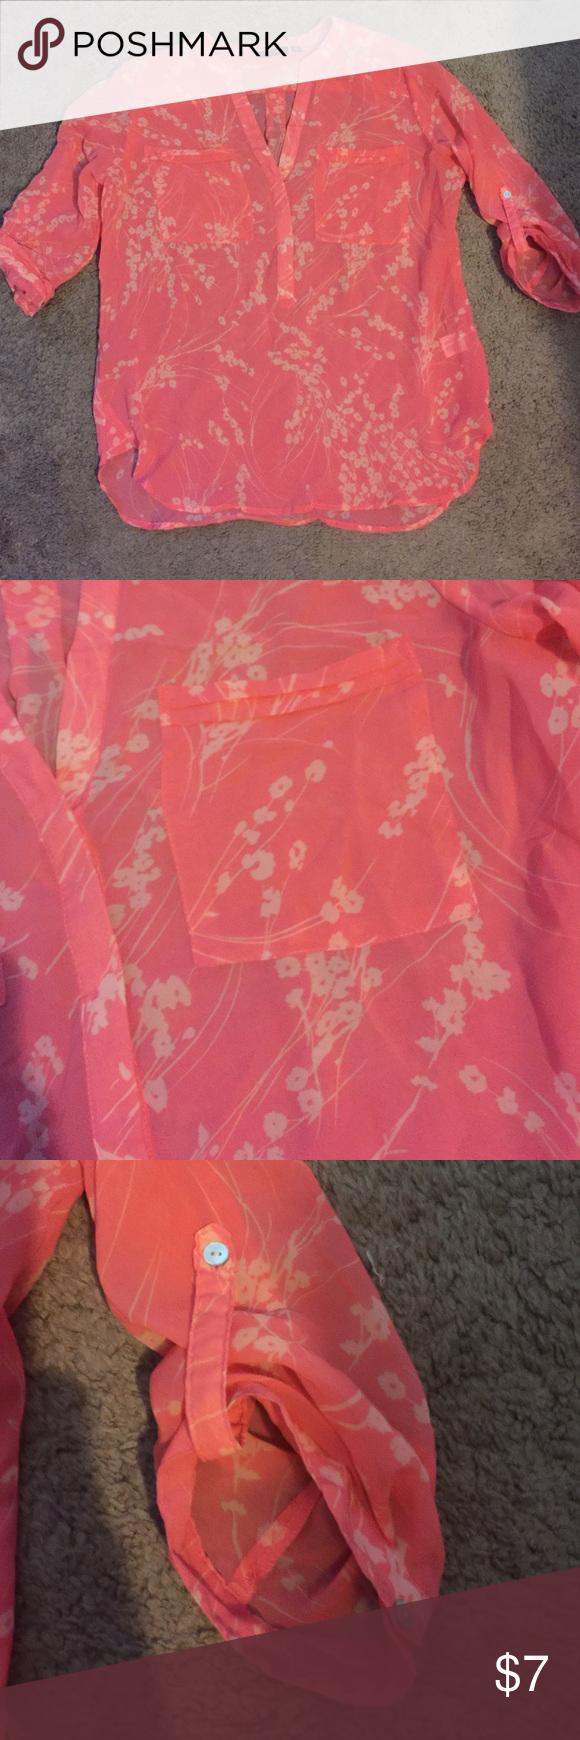 Sheer Like New Apt 9 Shirt My Posh Closet Shirts Closet